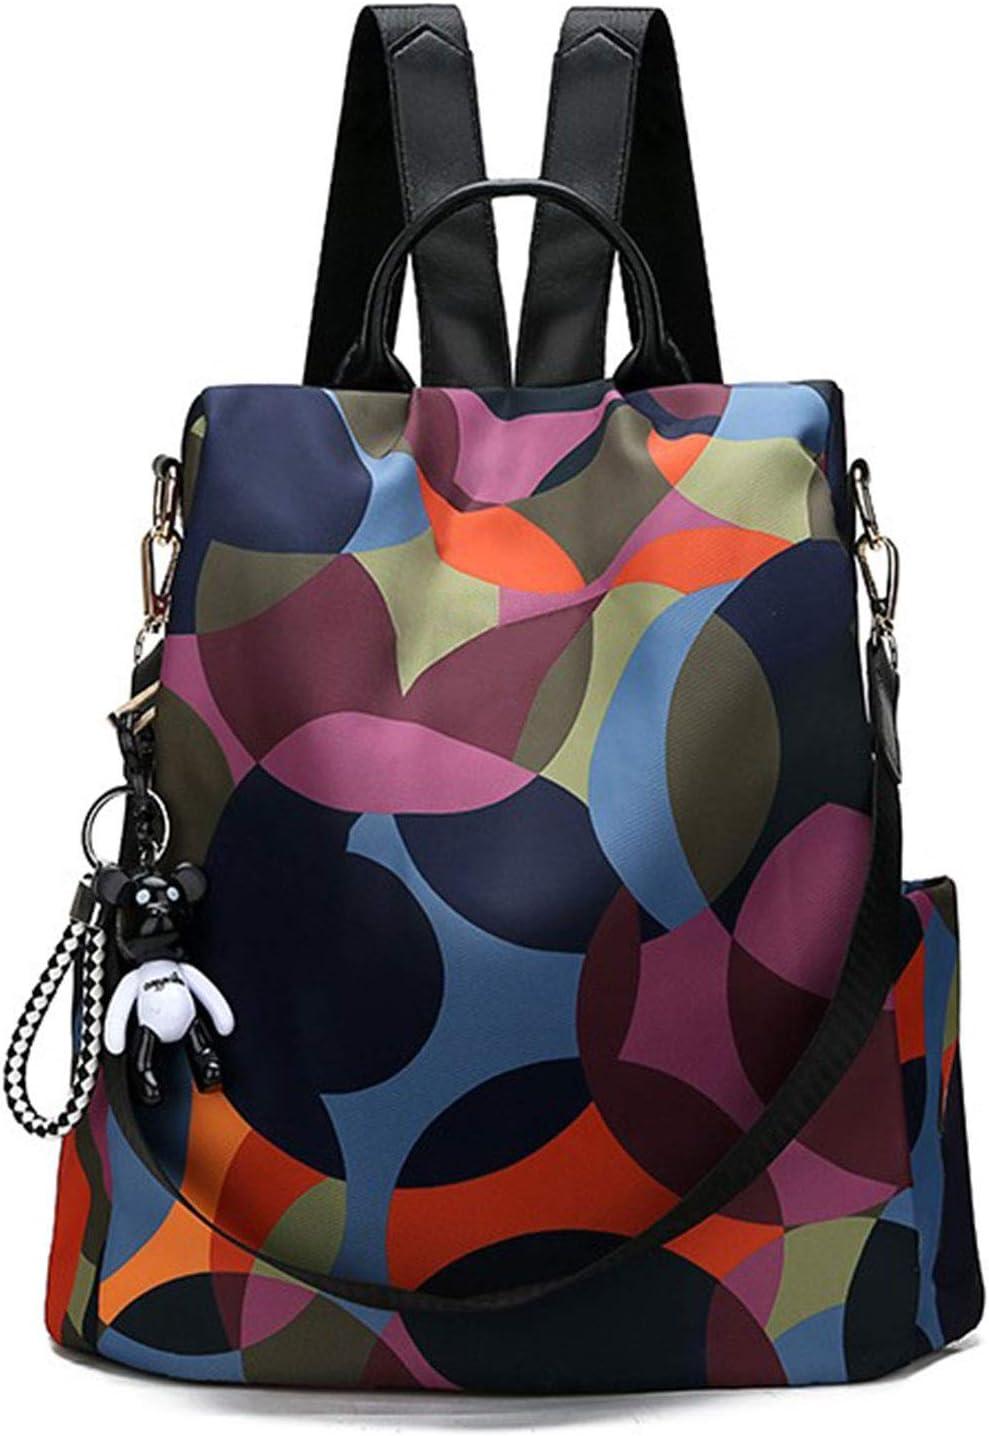 Freie Liebe Women Backpcak Purse Anti-Theft Waterproof Nylon Ladies Rucksack Lightweight Shoulder Bags